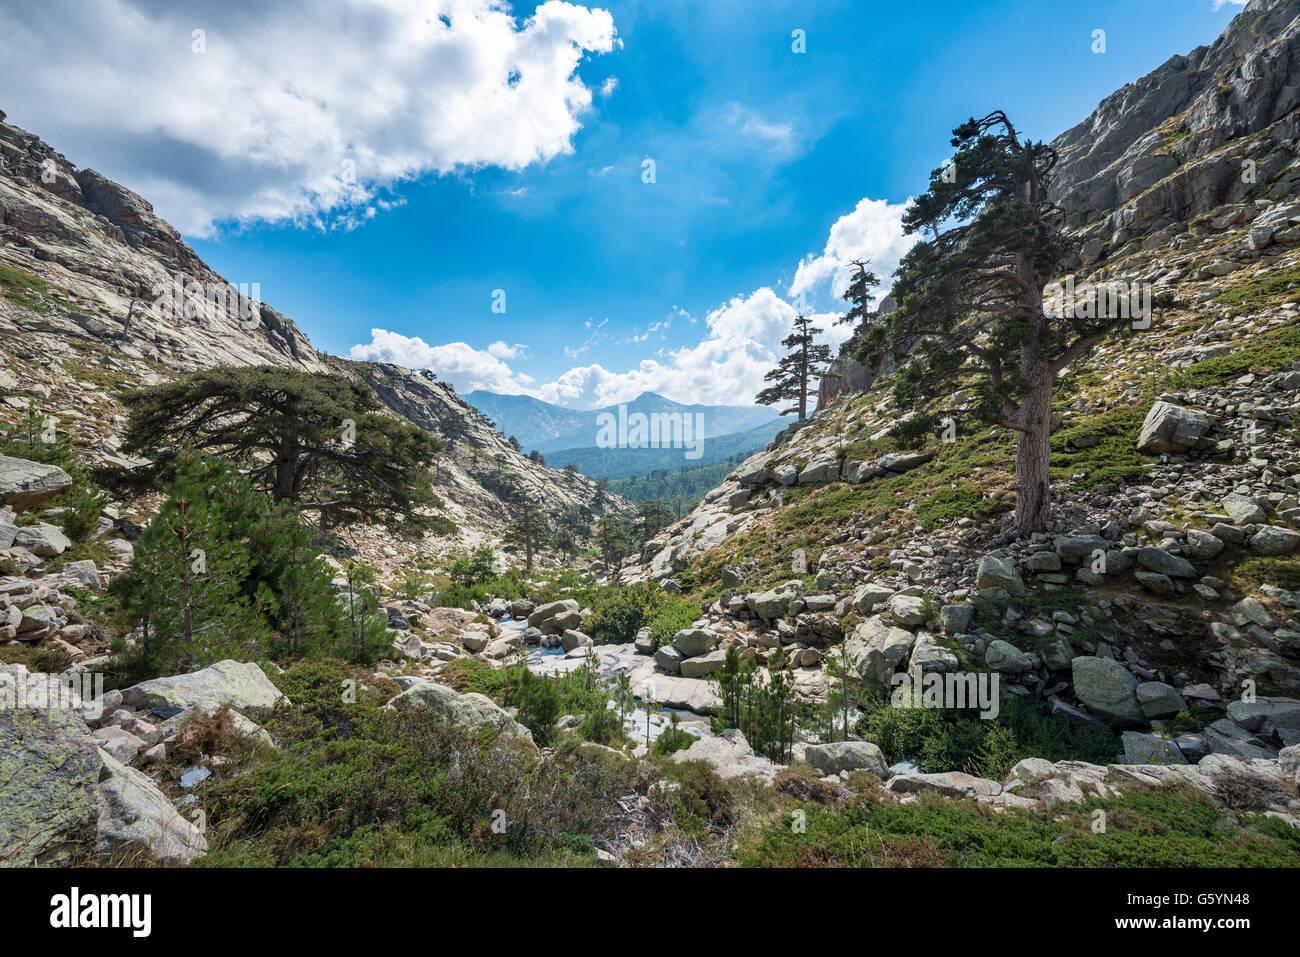 Paisaje montañoso en Golo Valley, el Parque Natural de Córcega, Parc naturel régional de Corse, Córcega, Francia Foto de stock